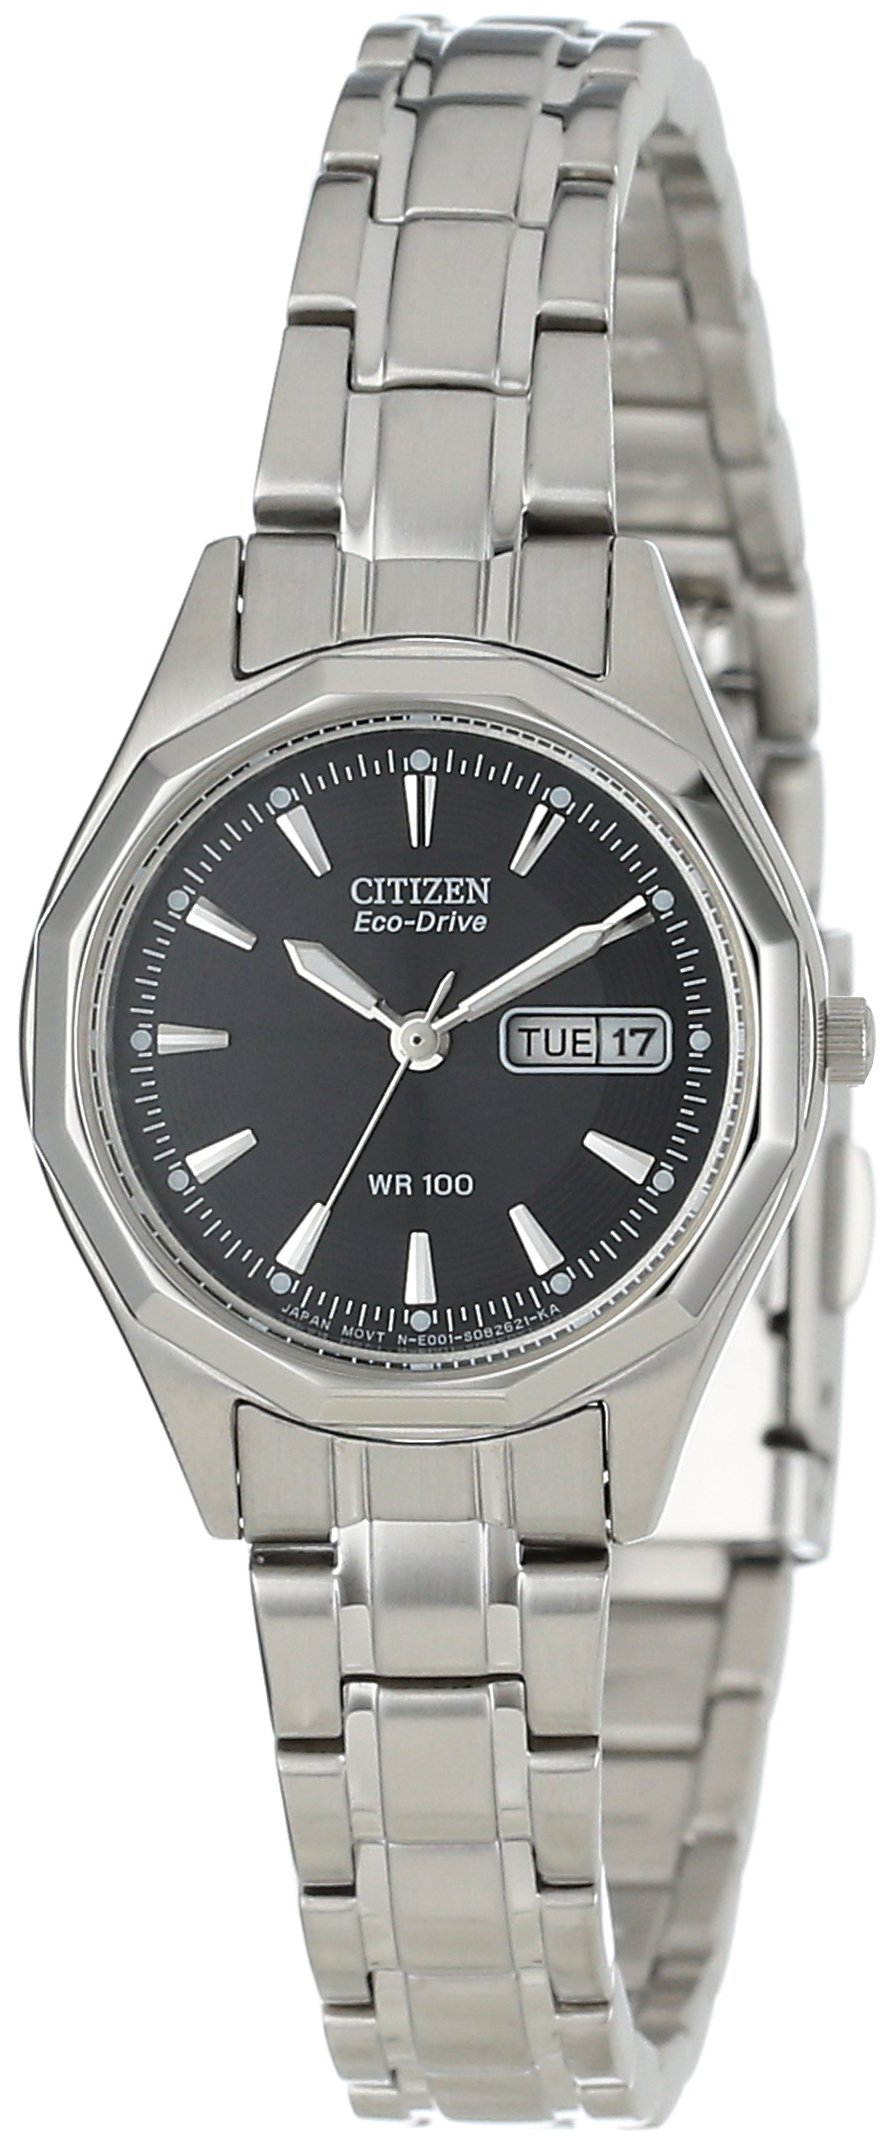 Citizen Women's EW3140-51E Eco-Drive Stainless Steel Sport Watch